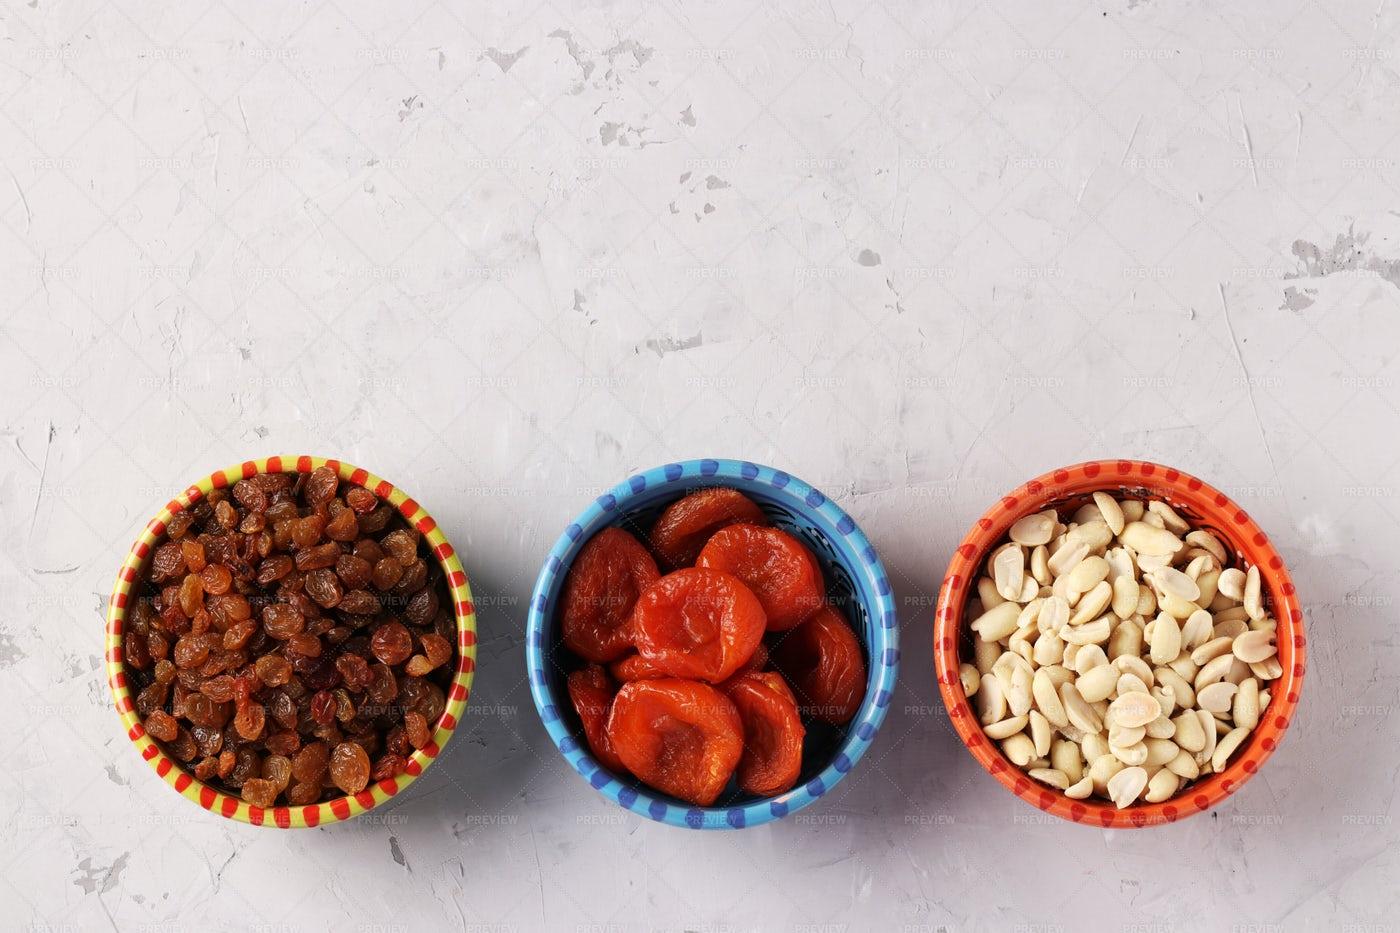 Apricot, Raisins, And Peanuts: Stock Photos